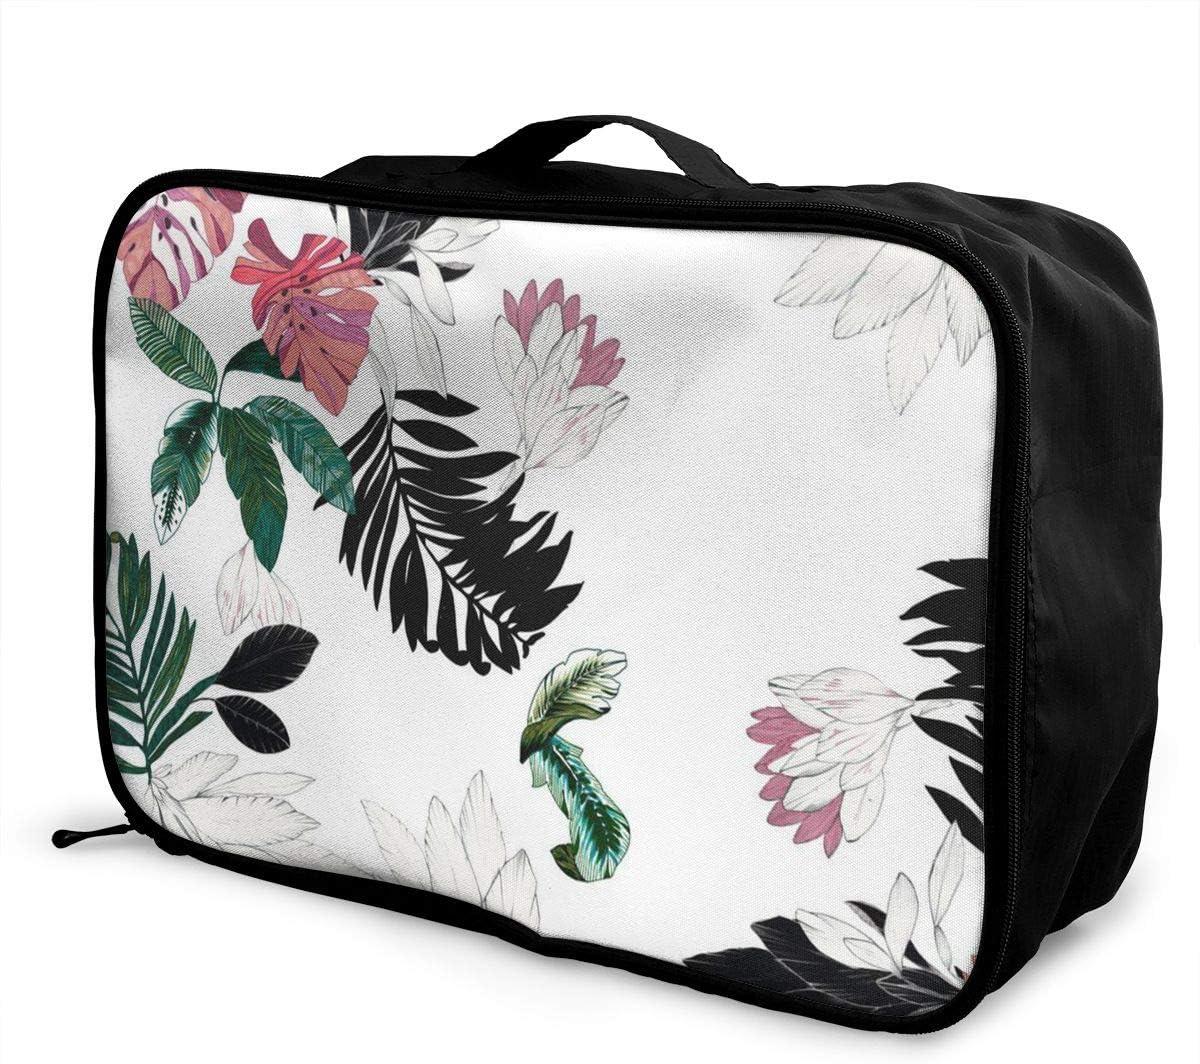 Flowers Travel Carry-on Luggage Weekender Bag Overnight Tote Flight Duffel In Trolley Handle